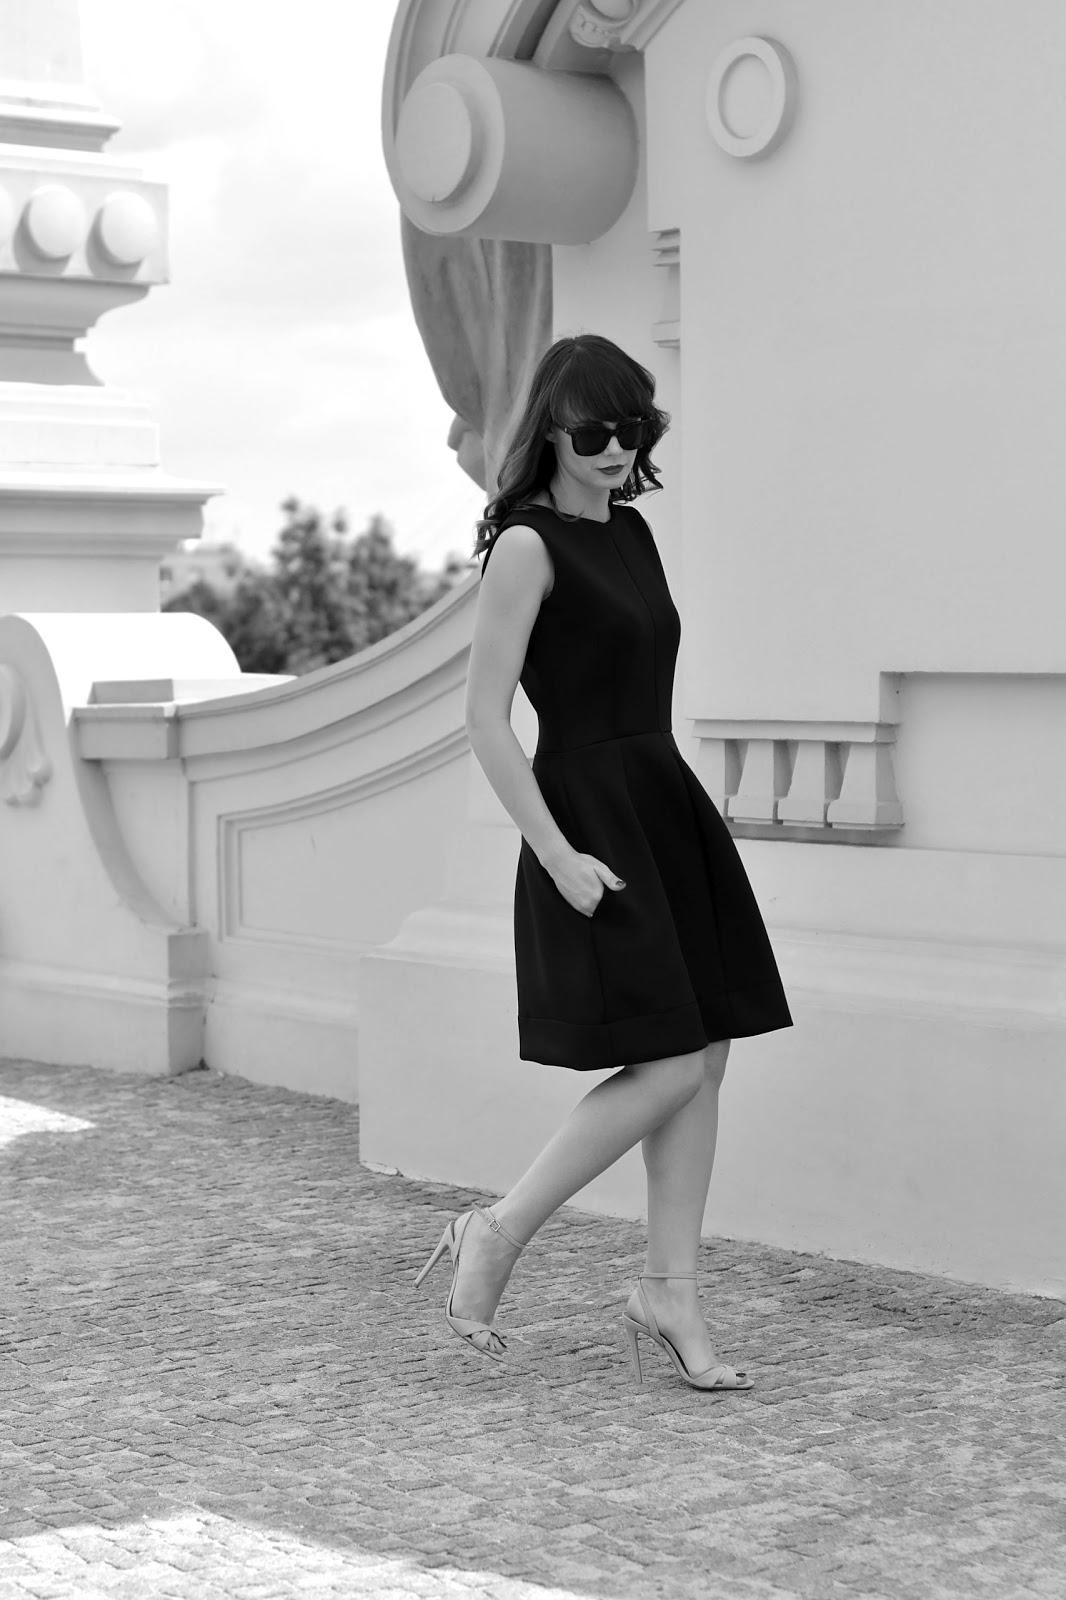 sukienka na kazda okazje | blog o modzie | blogerka | yuliya babich